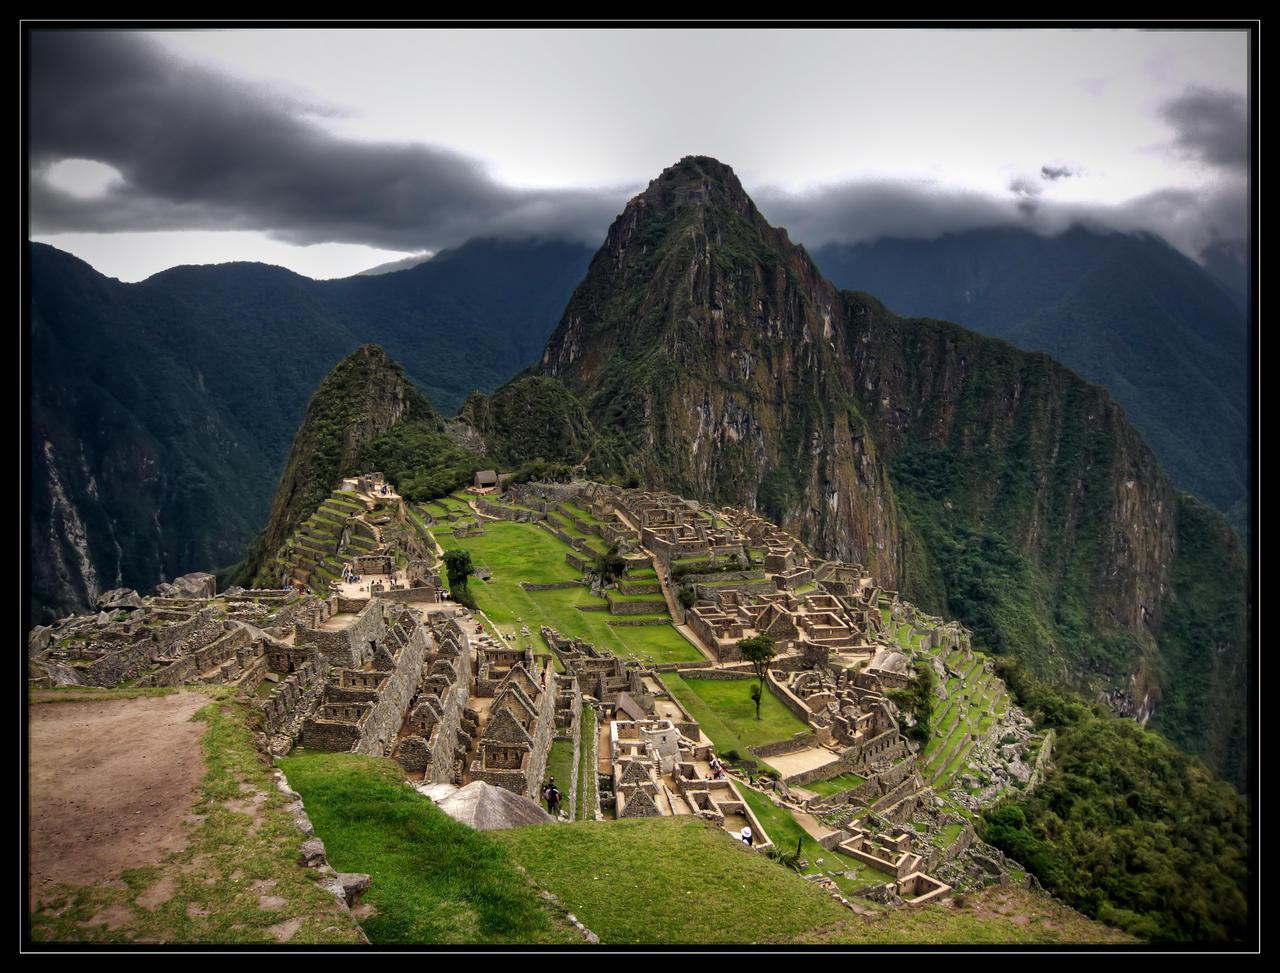 The Ruins of Machu Picchu by CashMcL